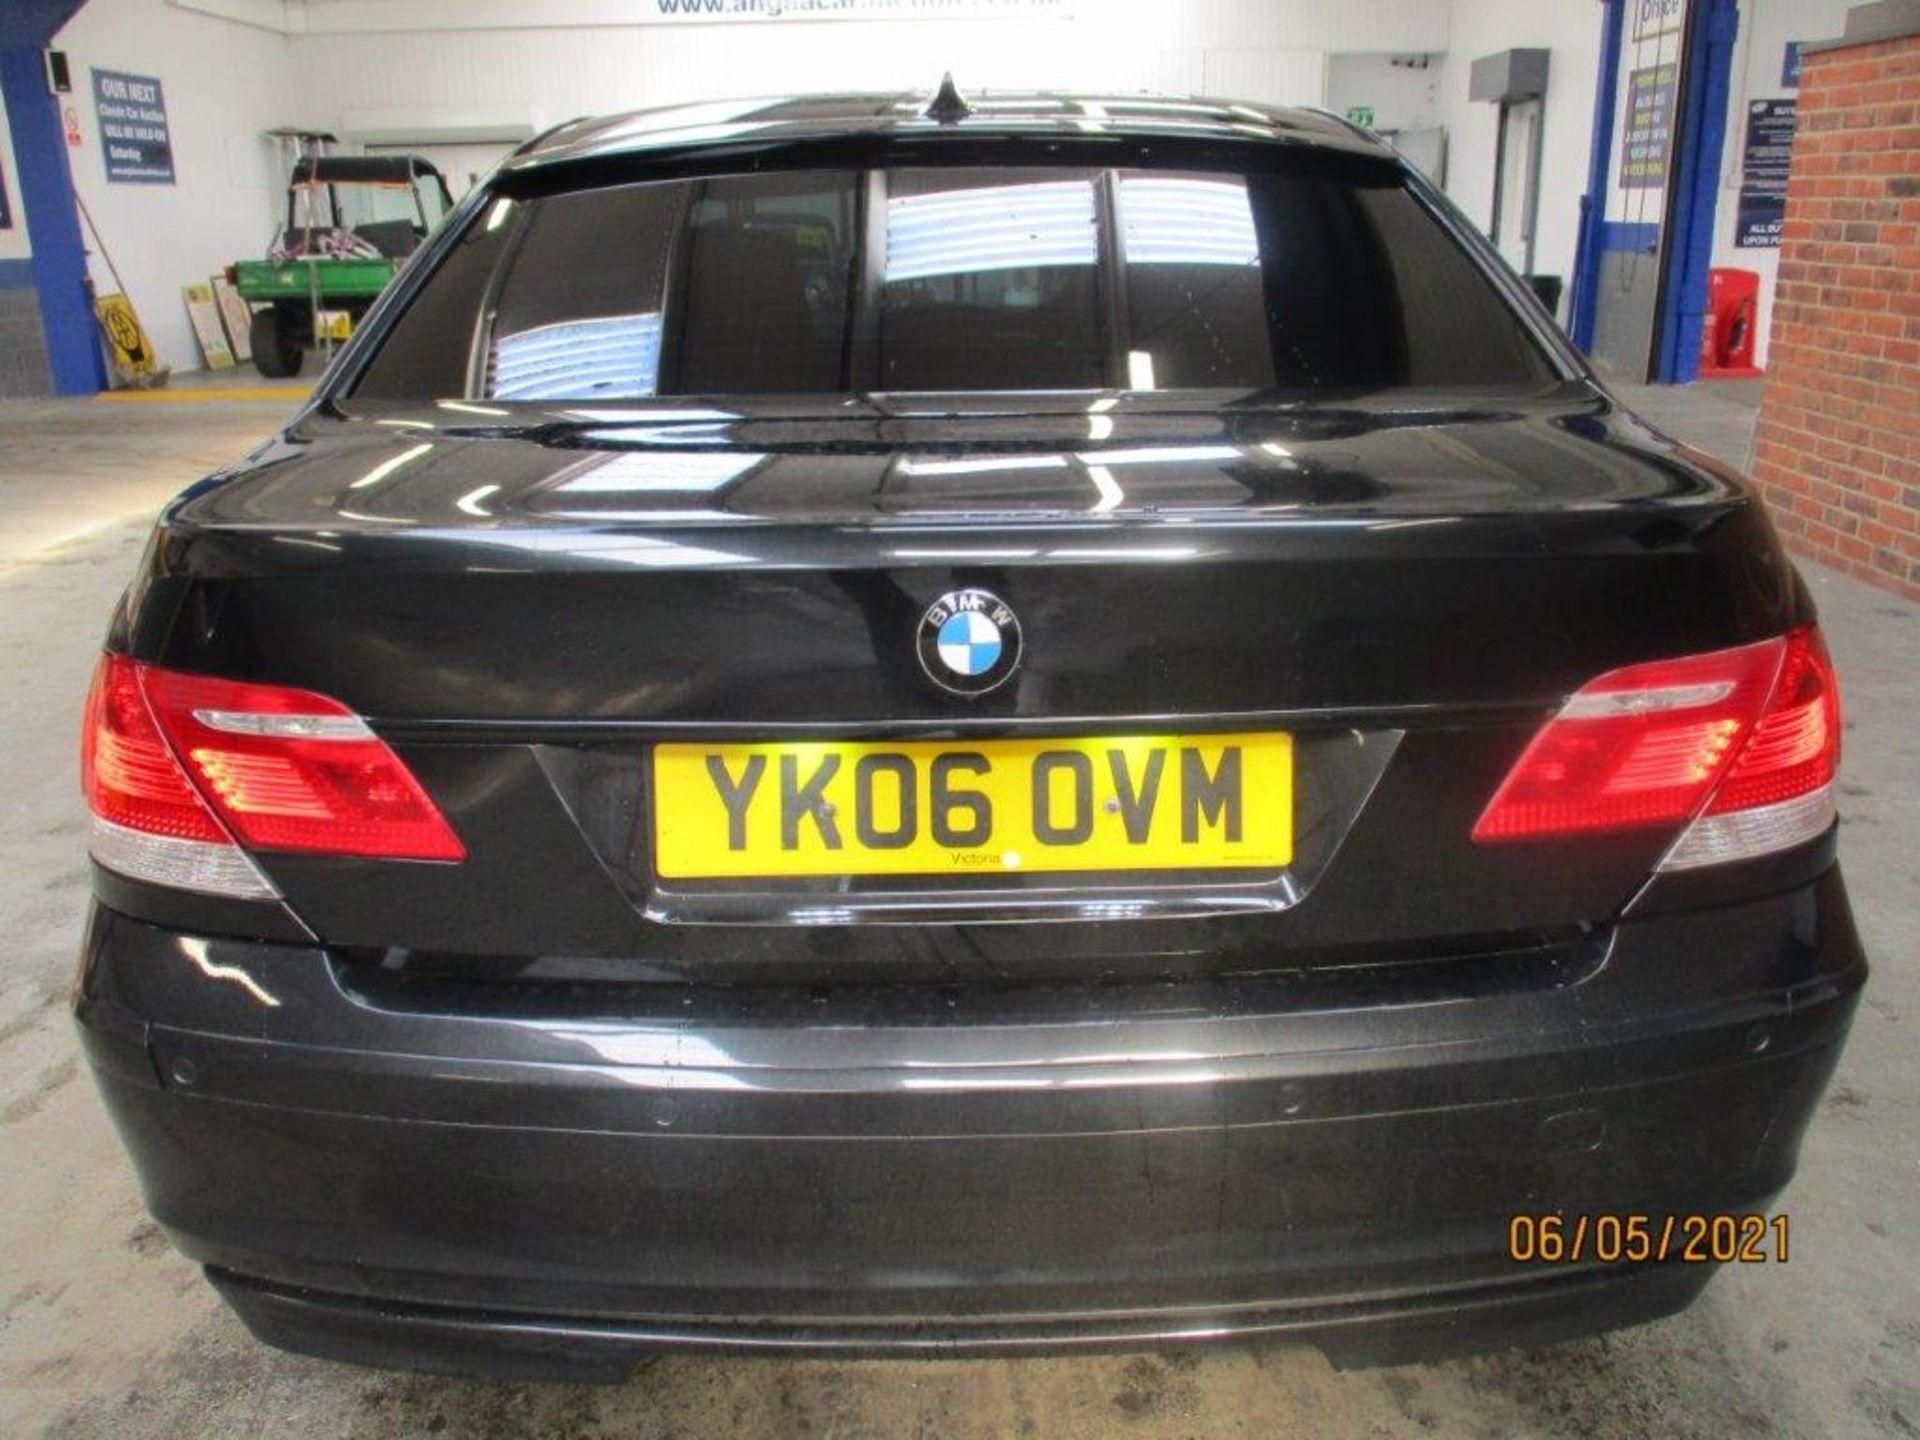 06 06 BMW 730 D Sport Auto - Image 3 of 23